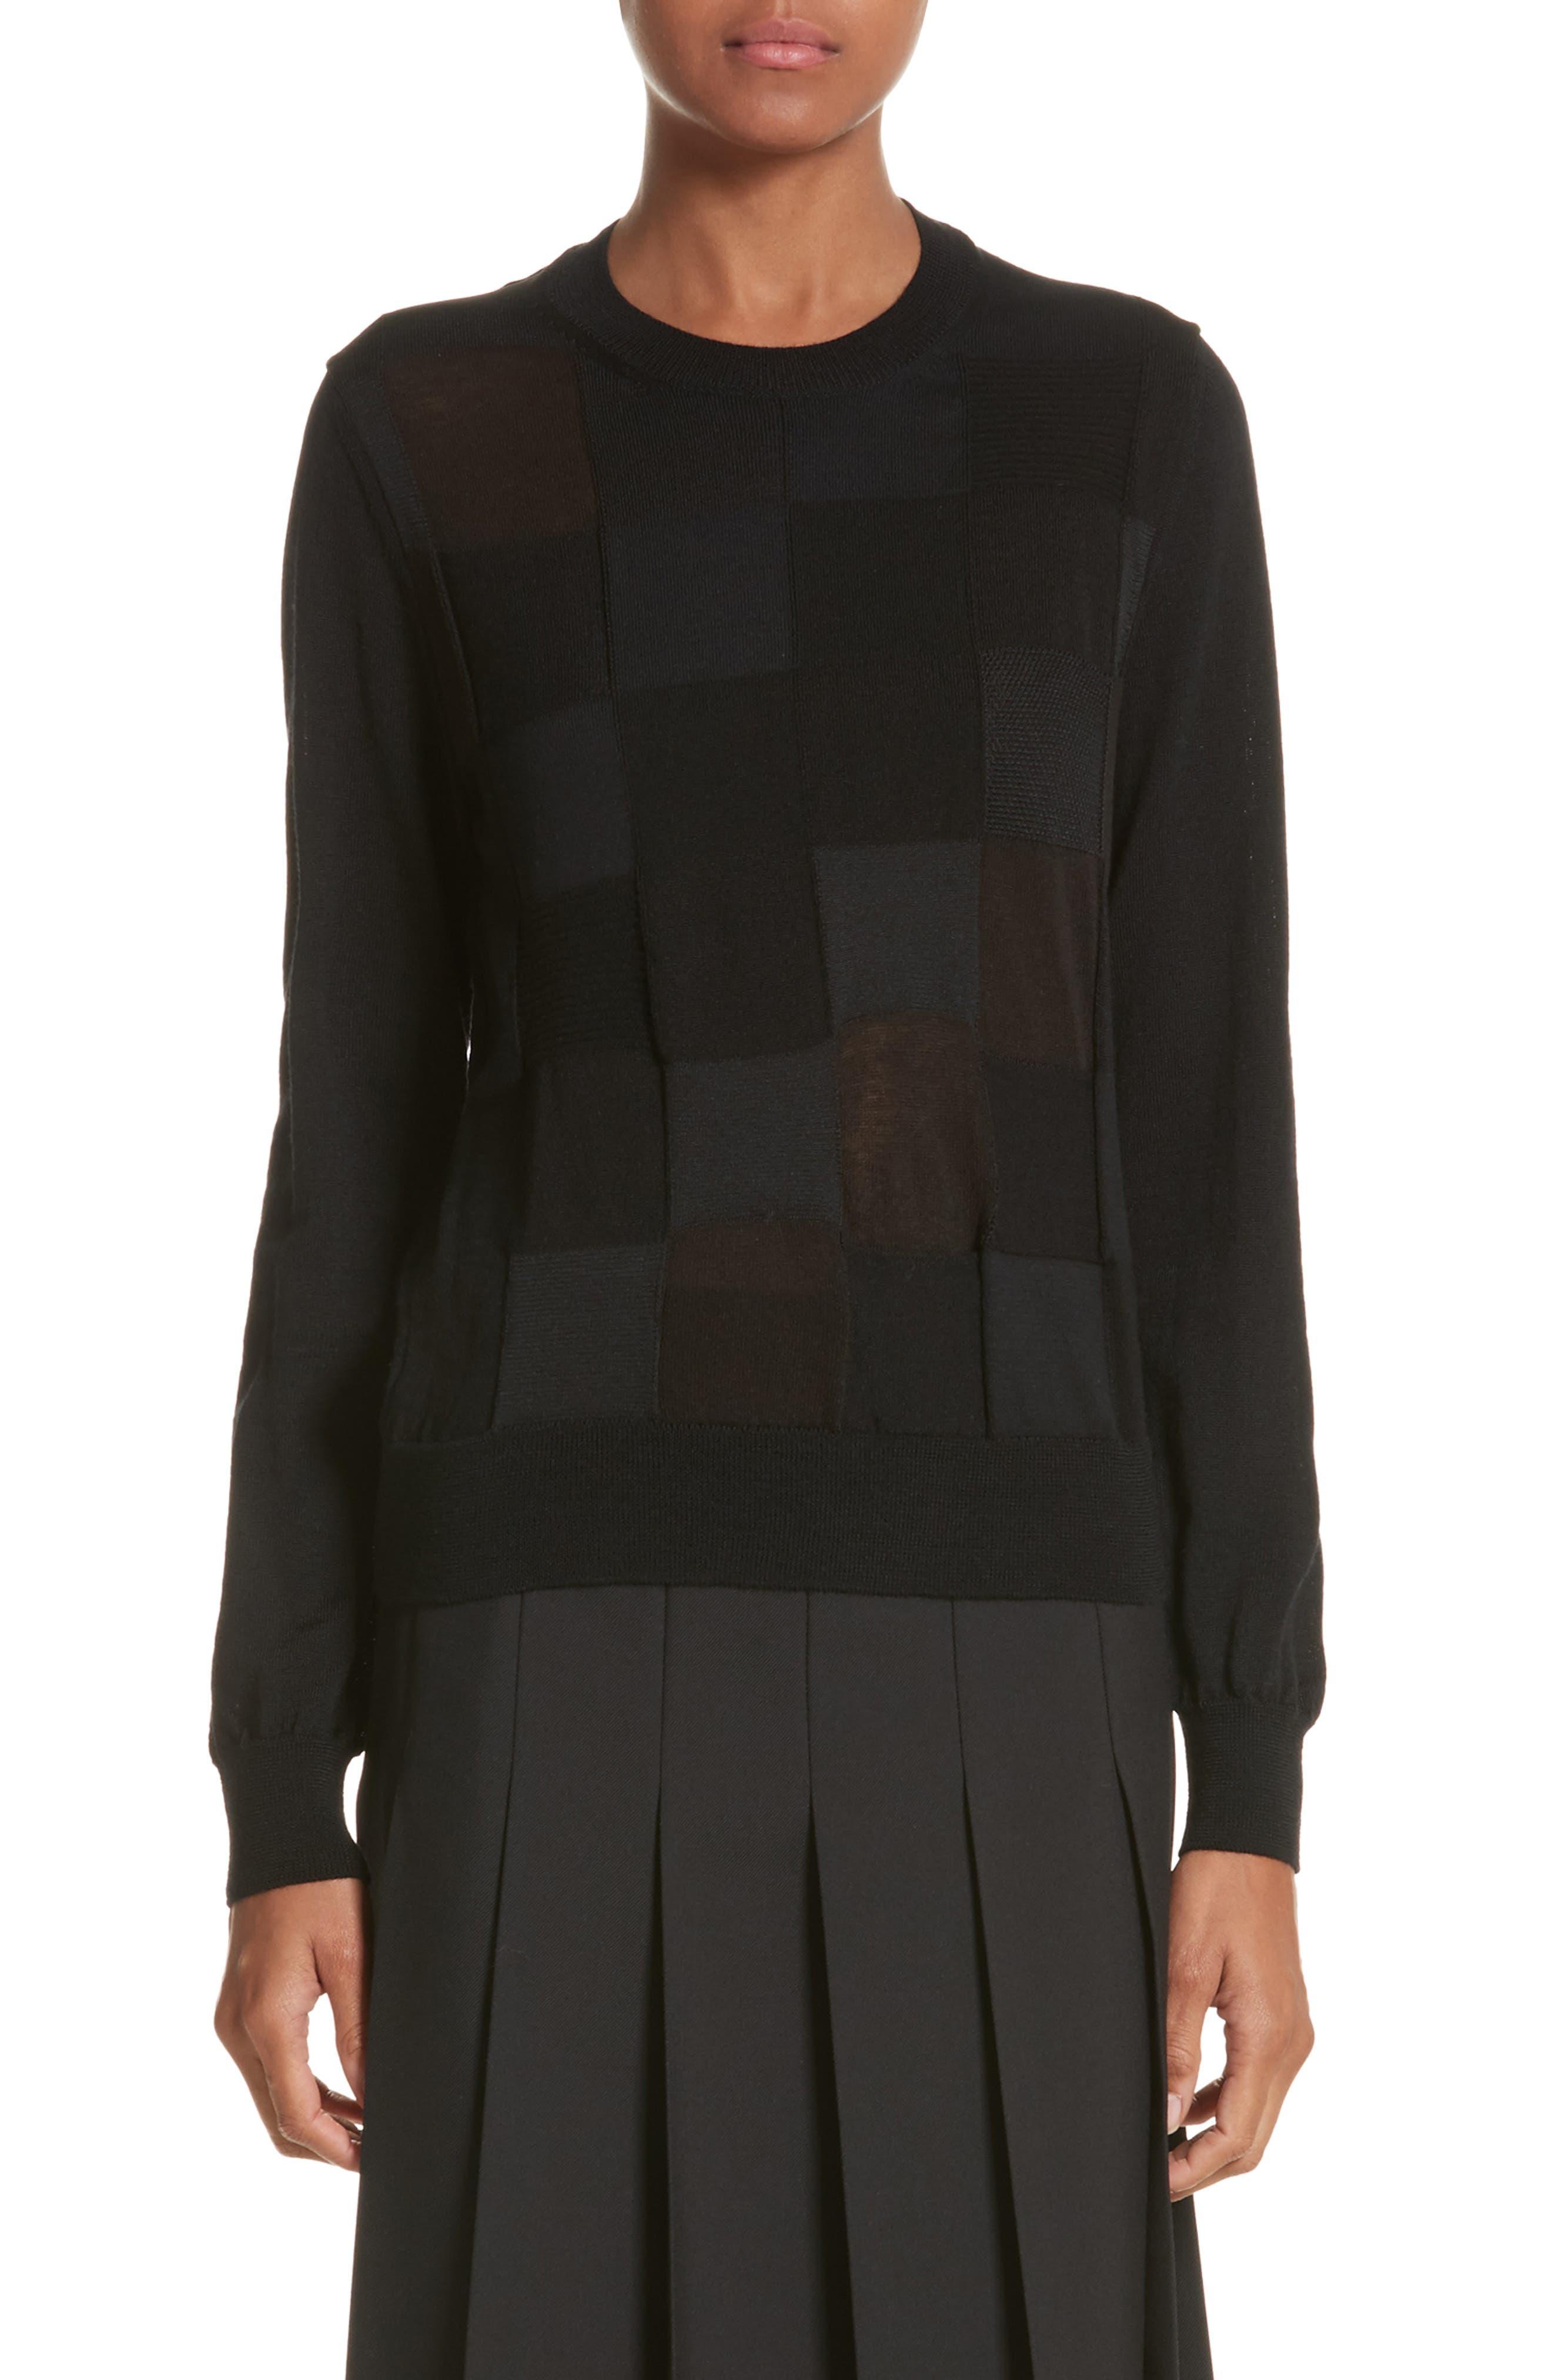 Main Image - Comme des Garçons Checkered Knit Sweater